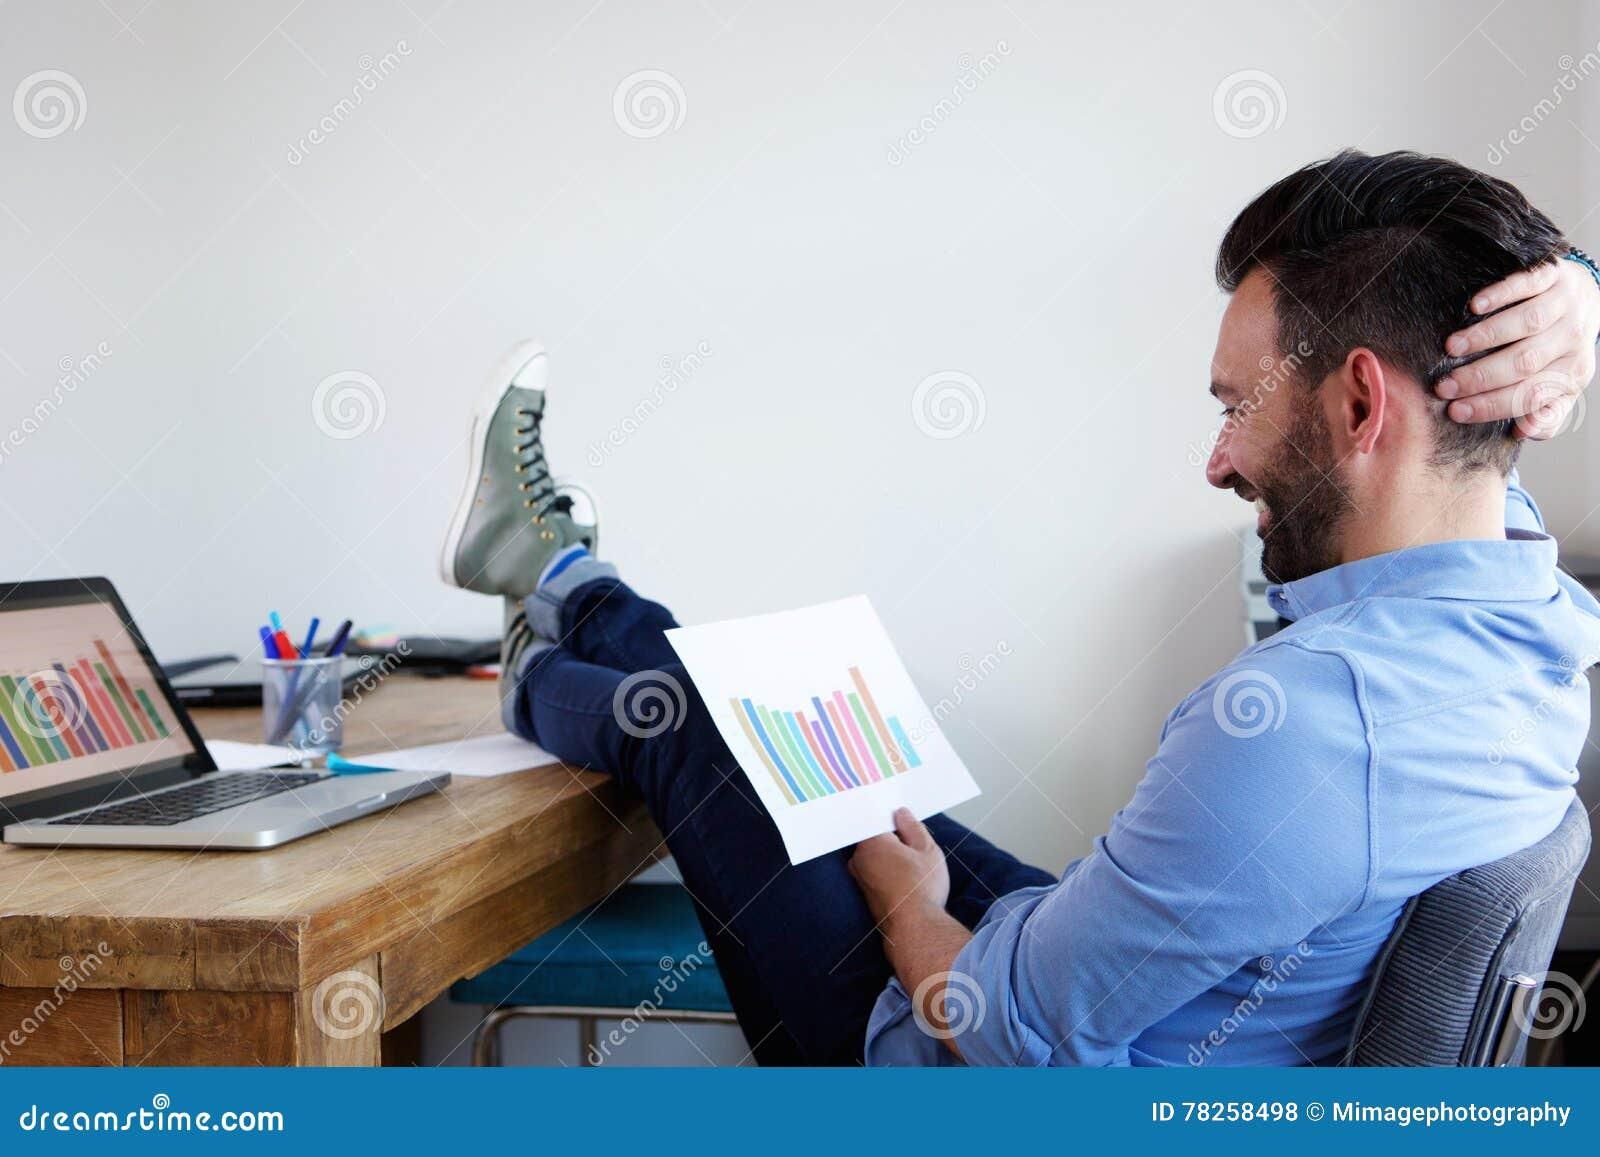 older business man at desk in office royalty free stock photo 20597373. Black Bedroom Furniture Sets. Home Design Ideas